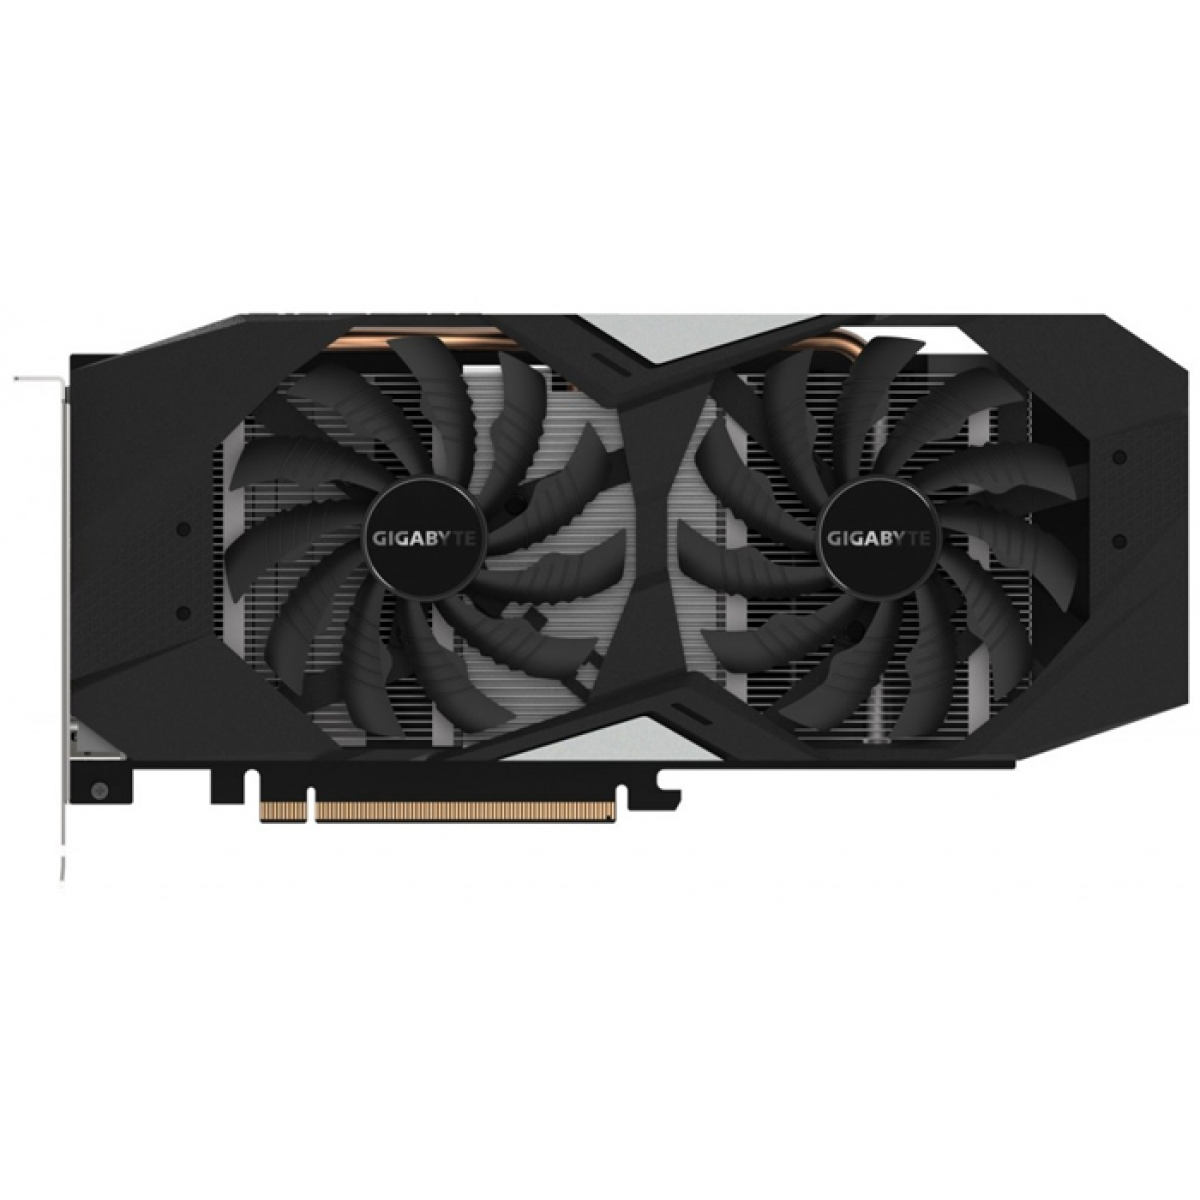 Placa de Vídeo Gigabyte GeForce GTX 1660 Ti Windforce OC Dual, 6GB GDDR6, 192Bit, GV-N166TWF2OC-6GD